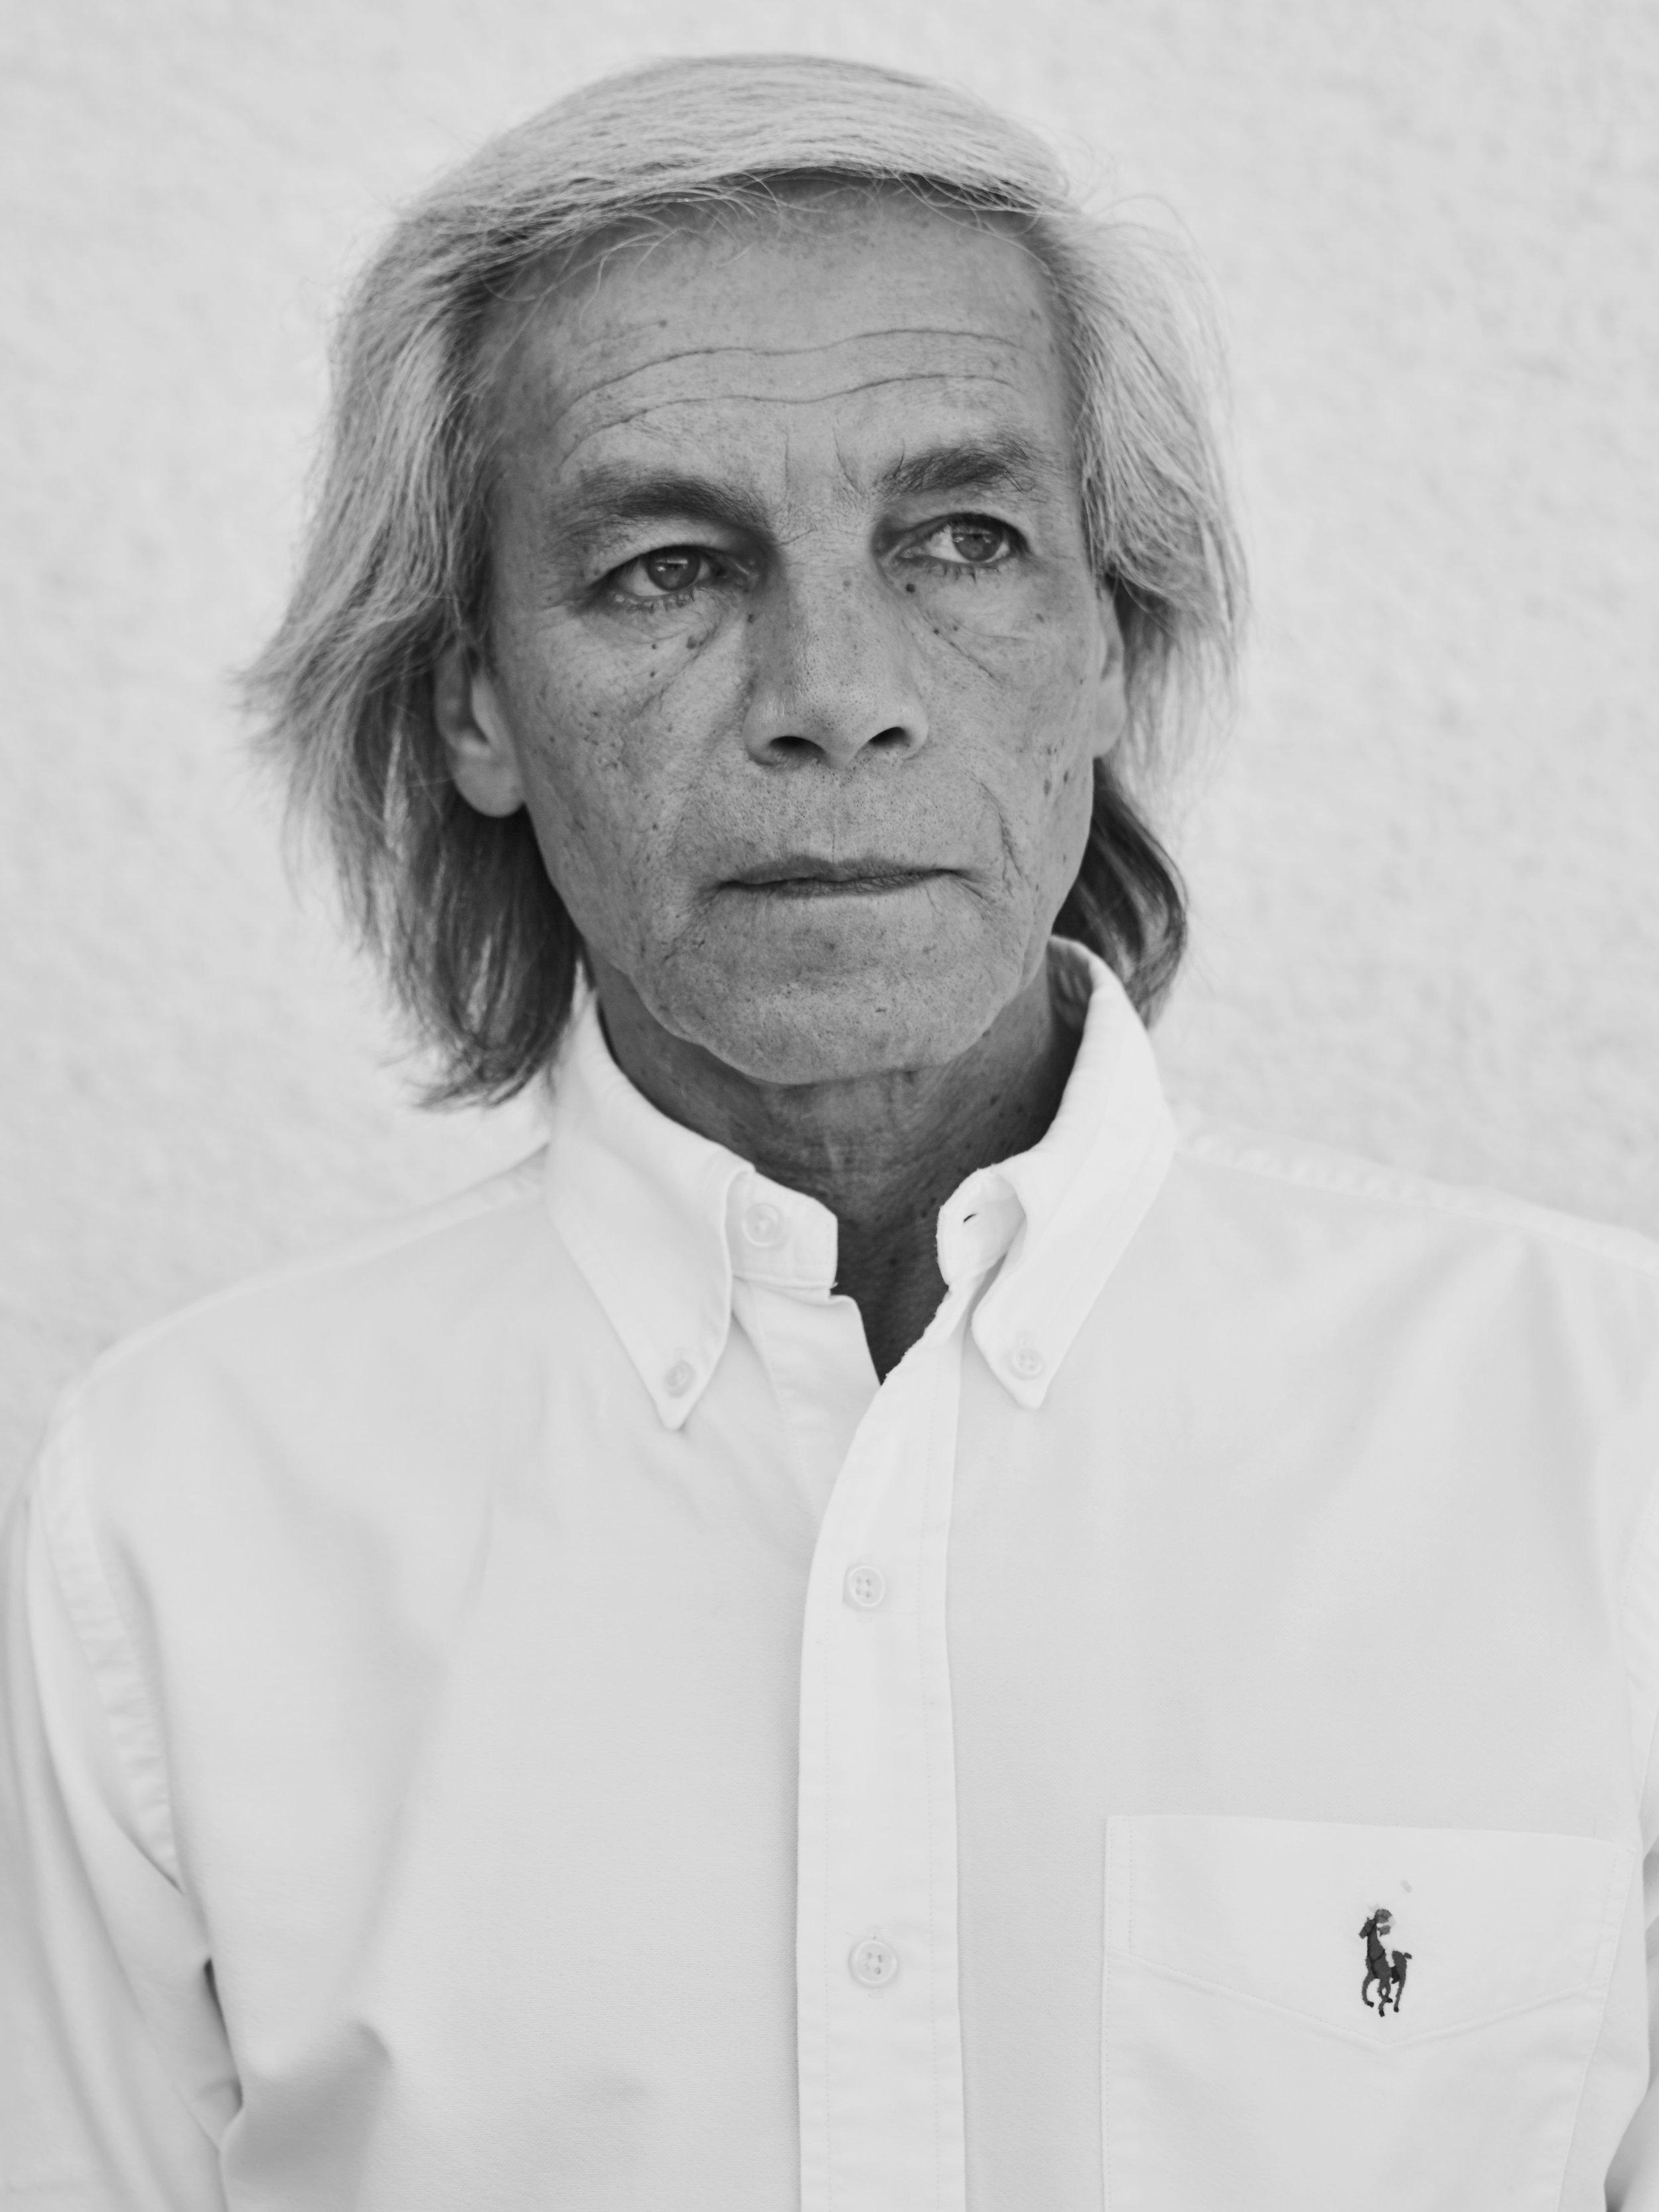 Javier Portrait Lexinario.jpg